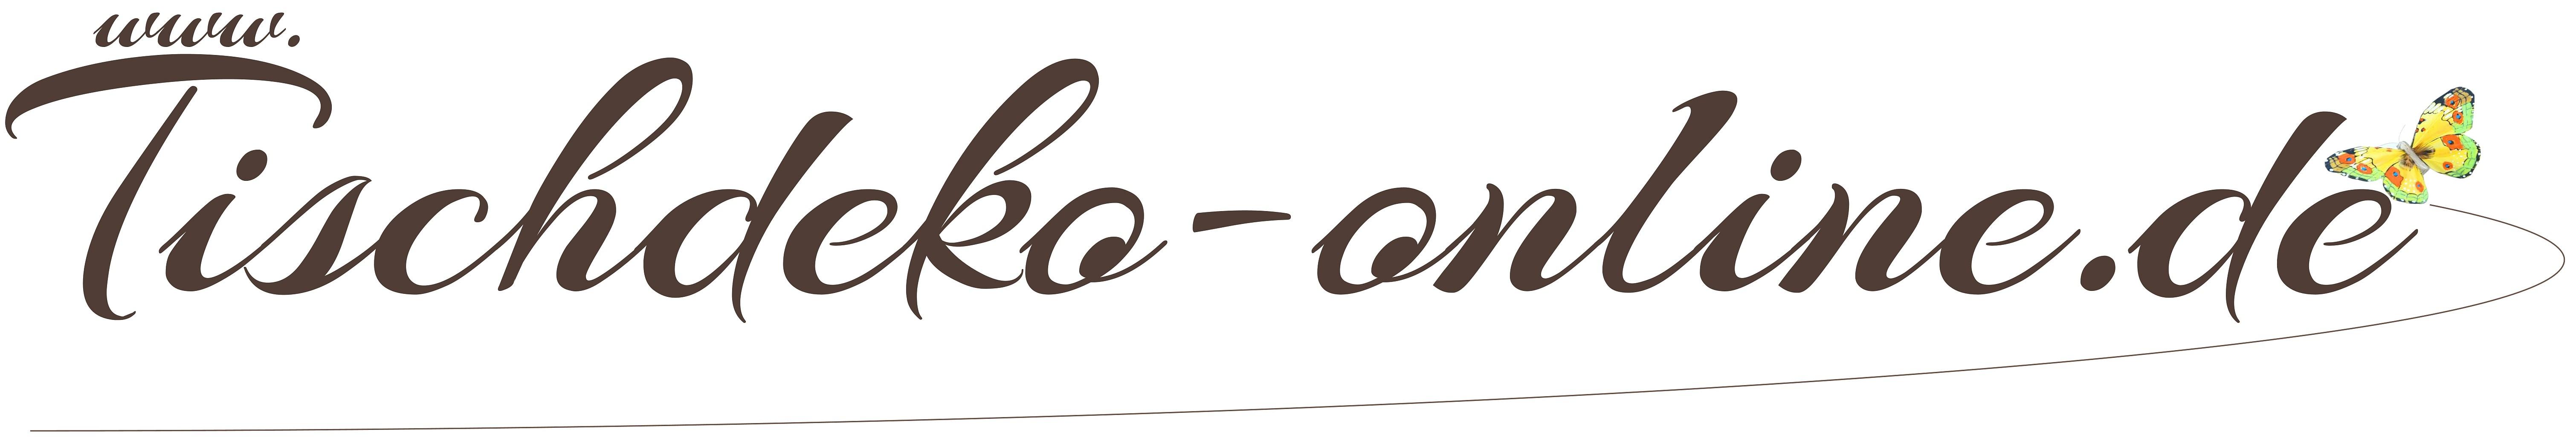 Tischdeko-online-Logo